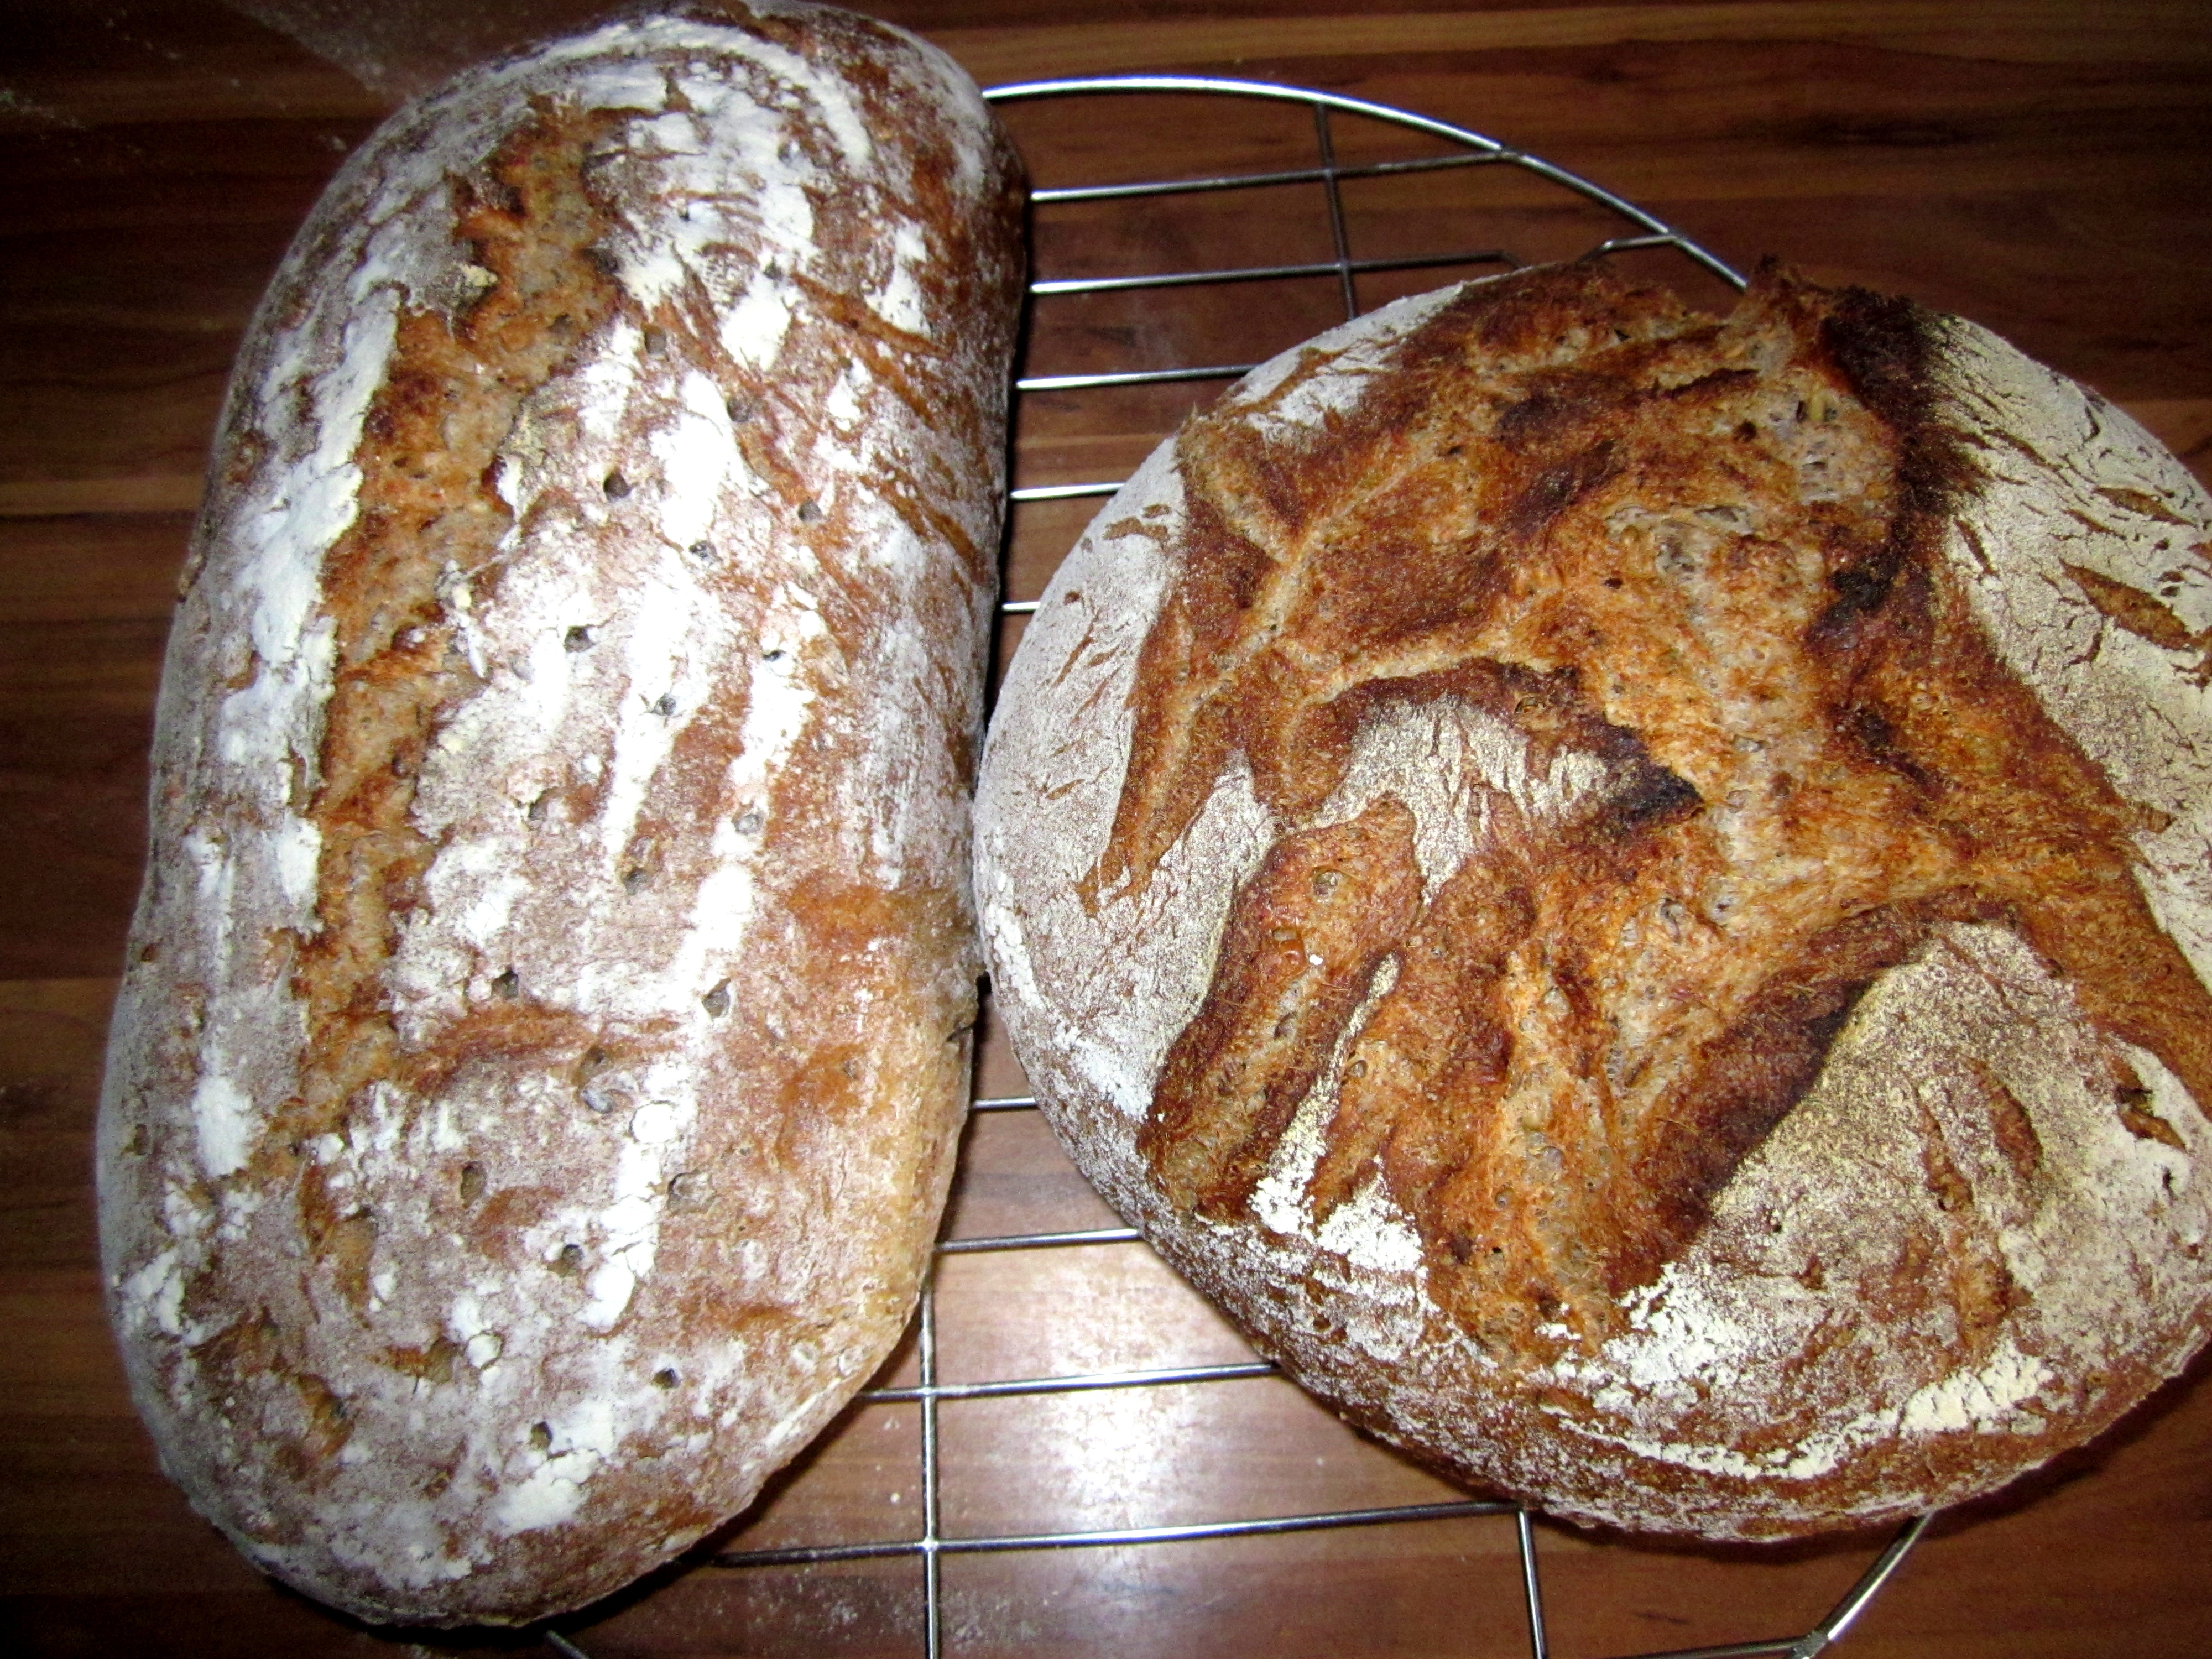 Das Rumford-Brot